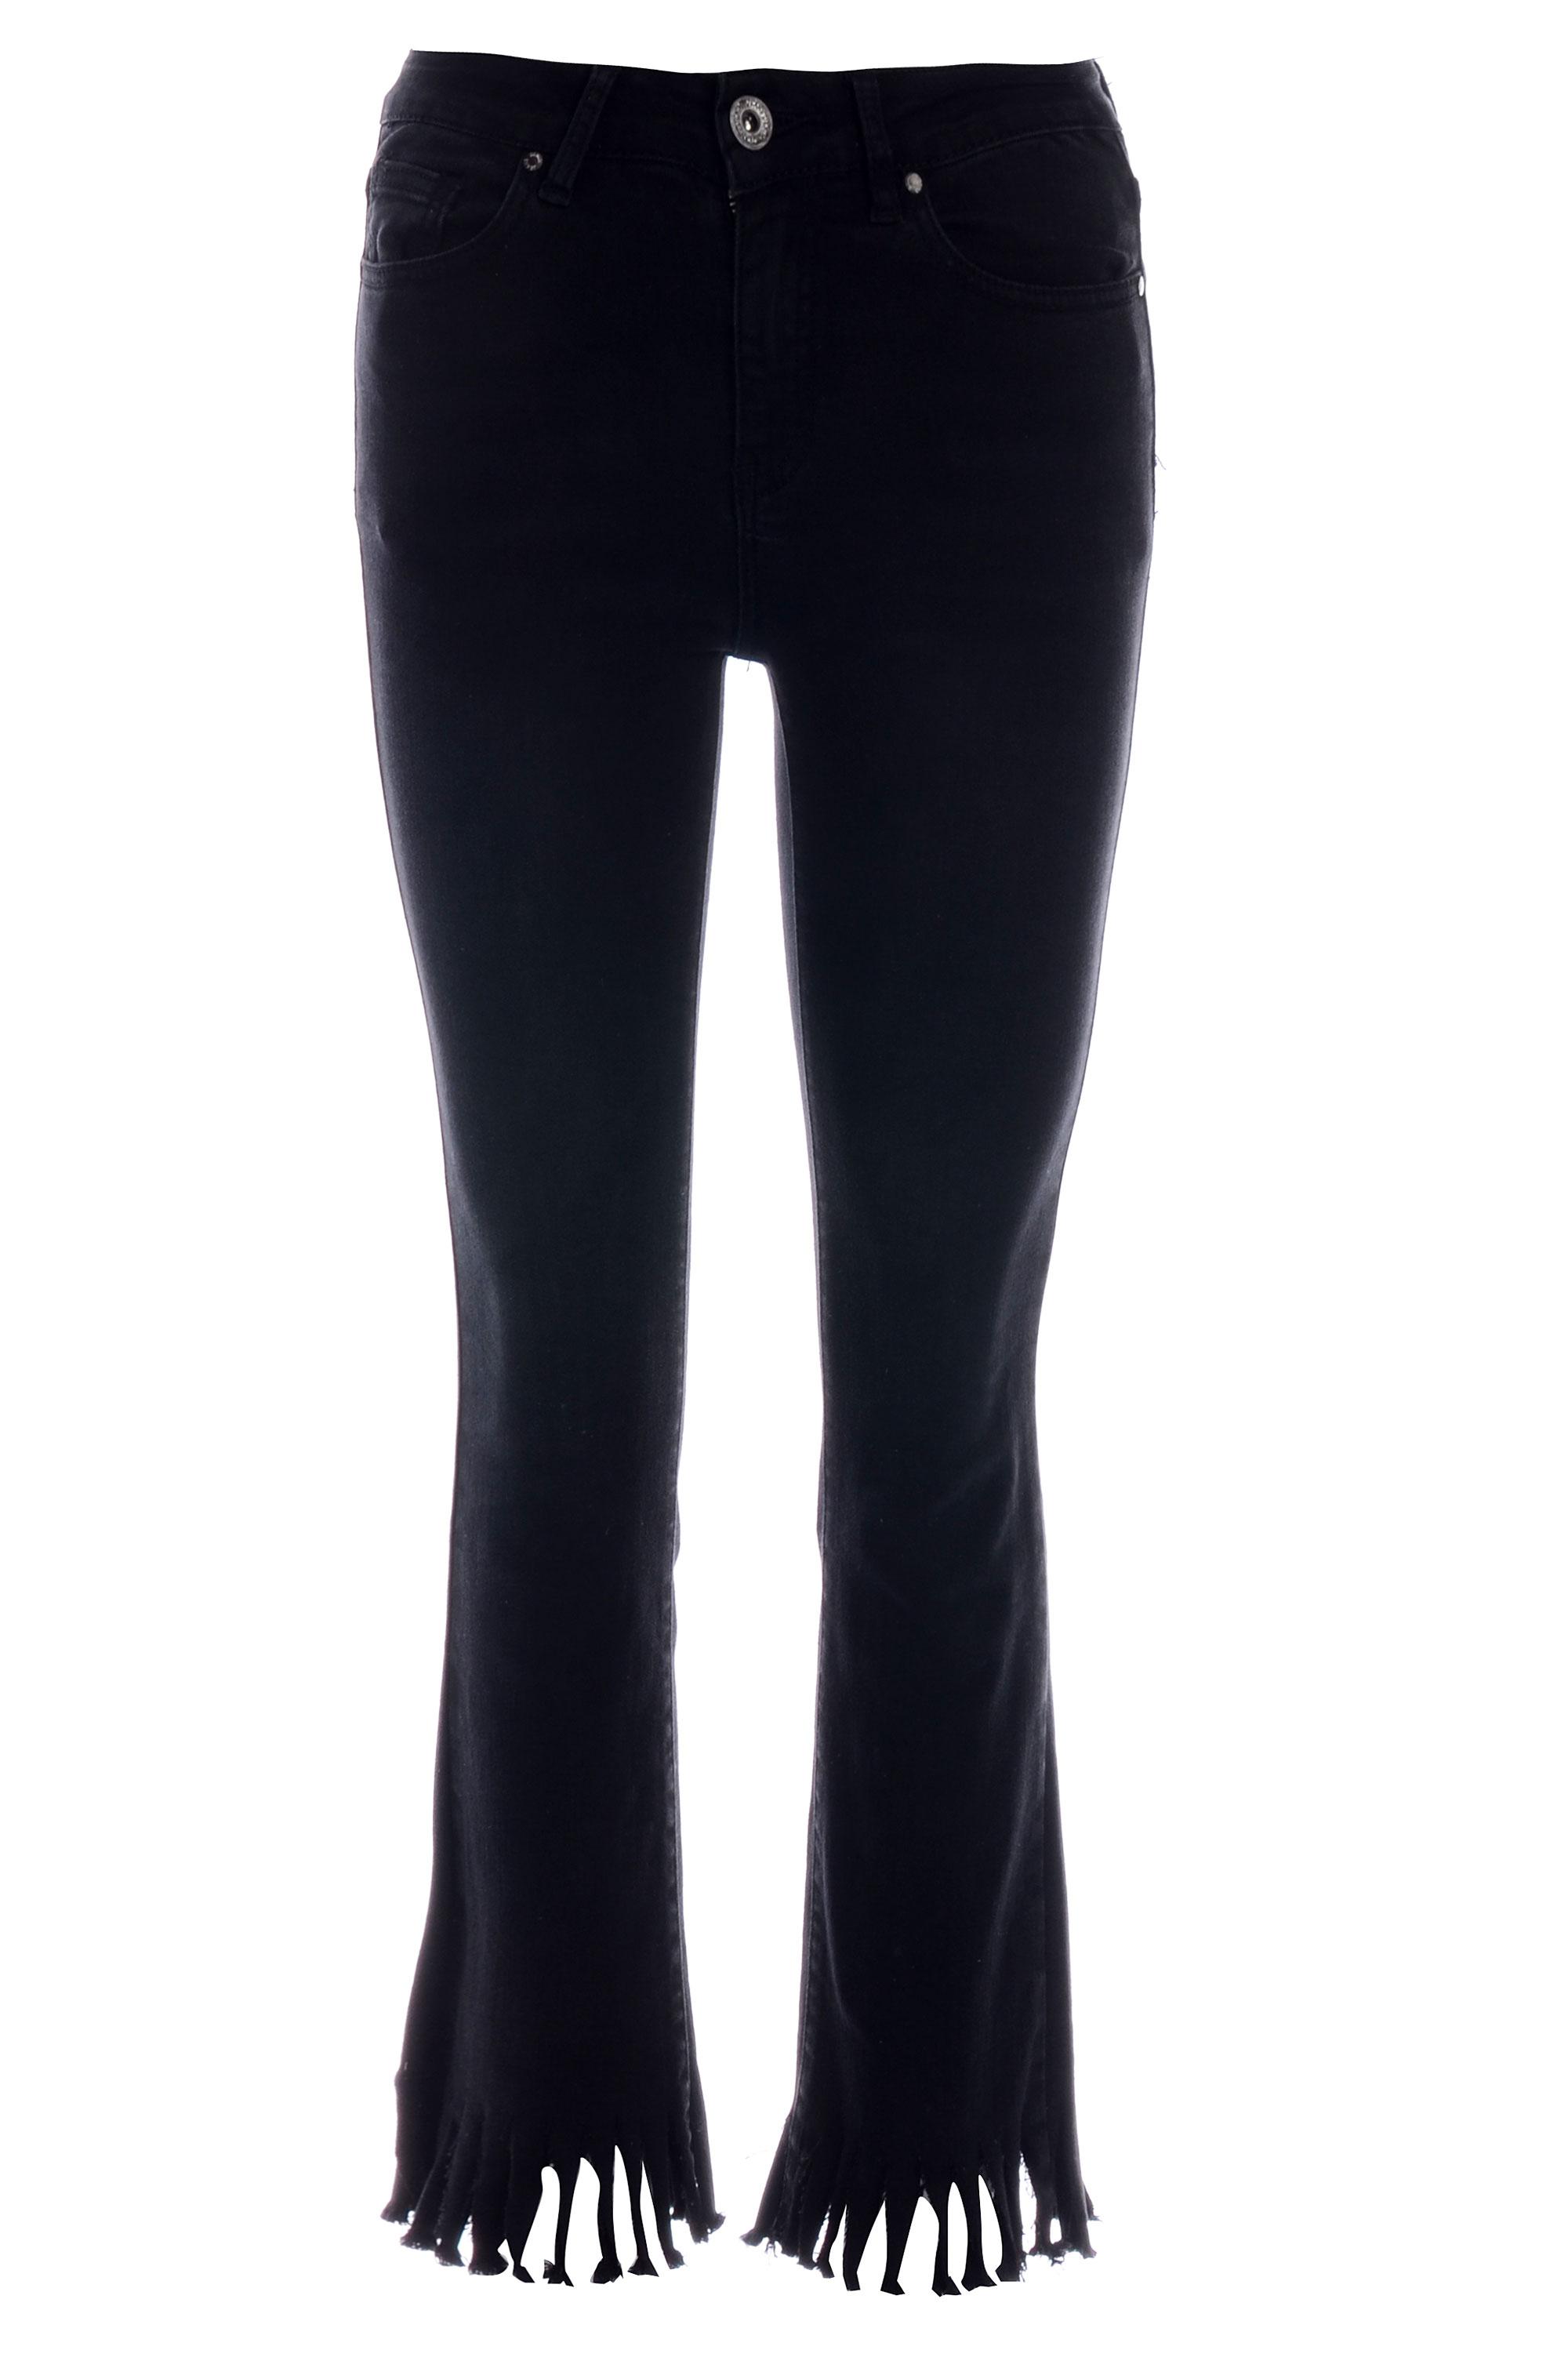 Spodnie - 42-631 NERO - Unisono